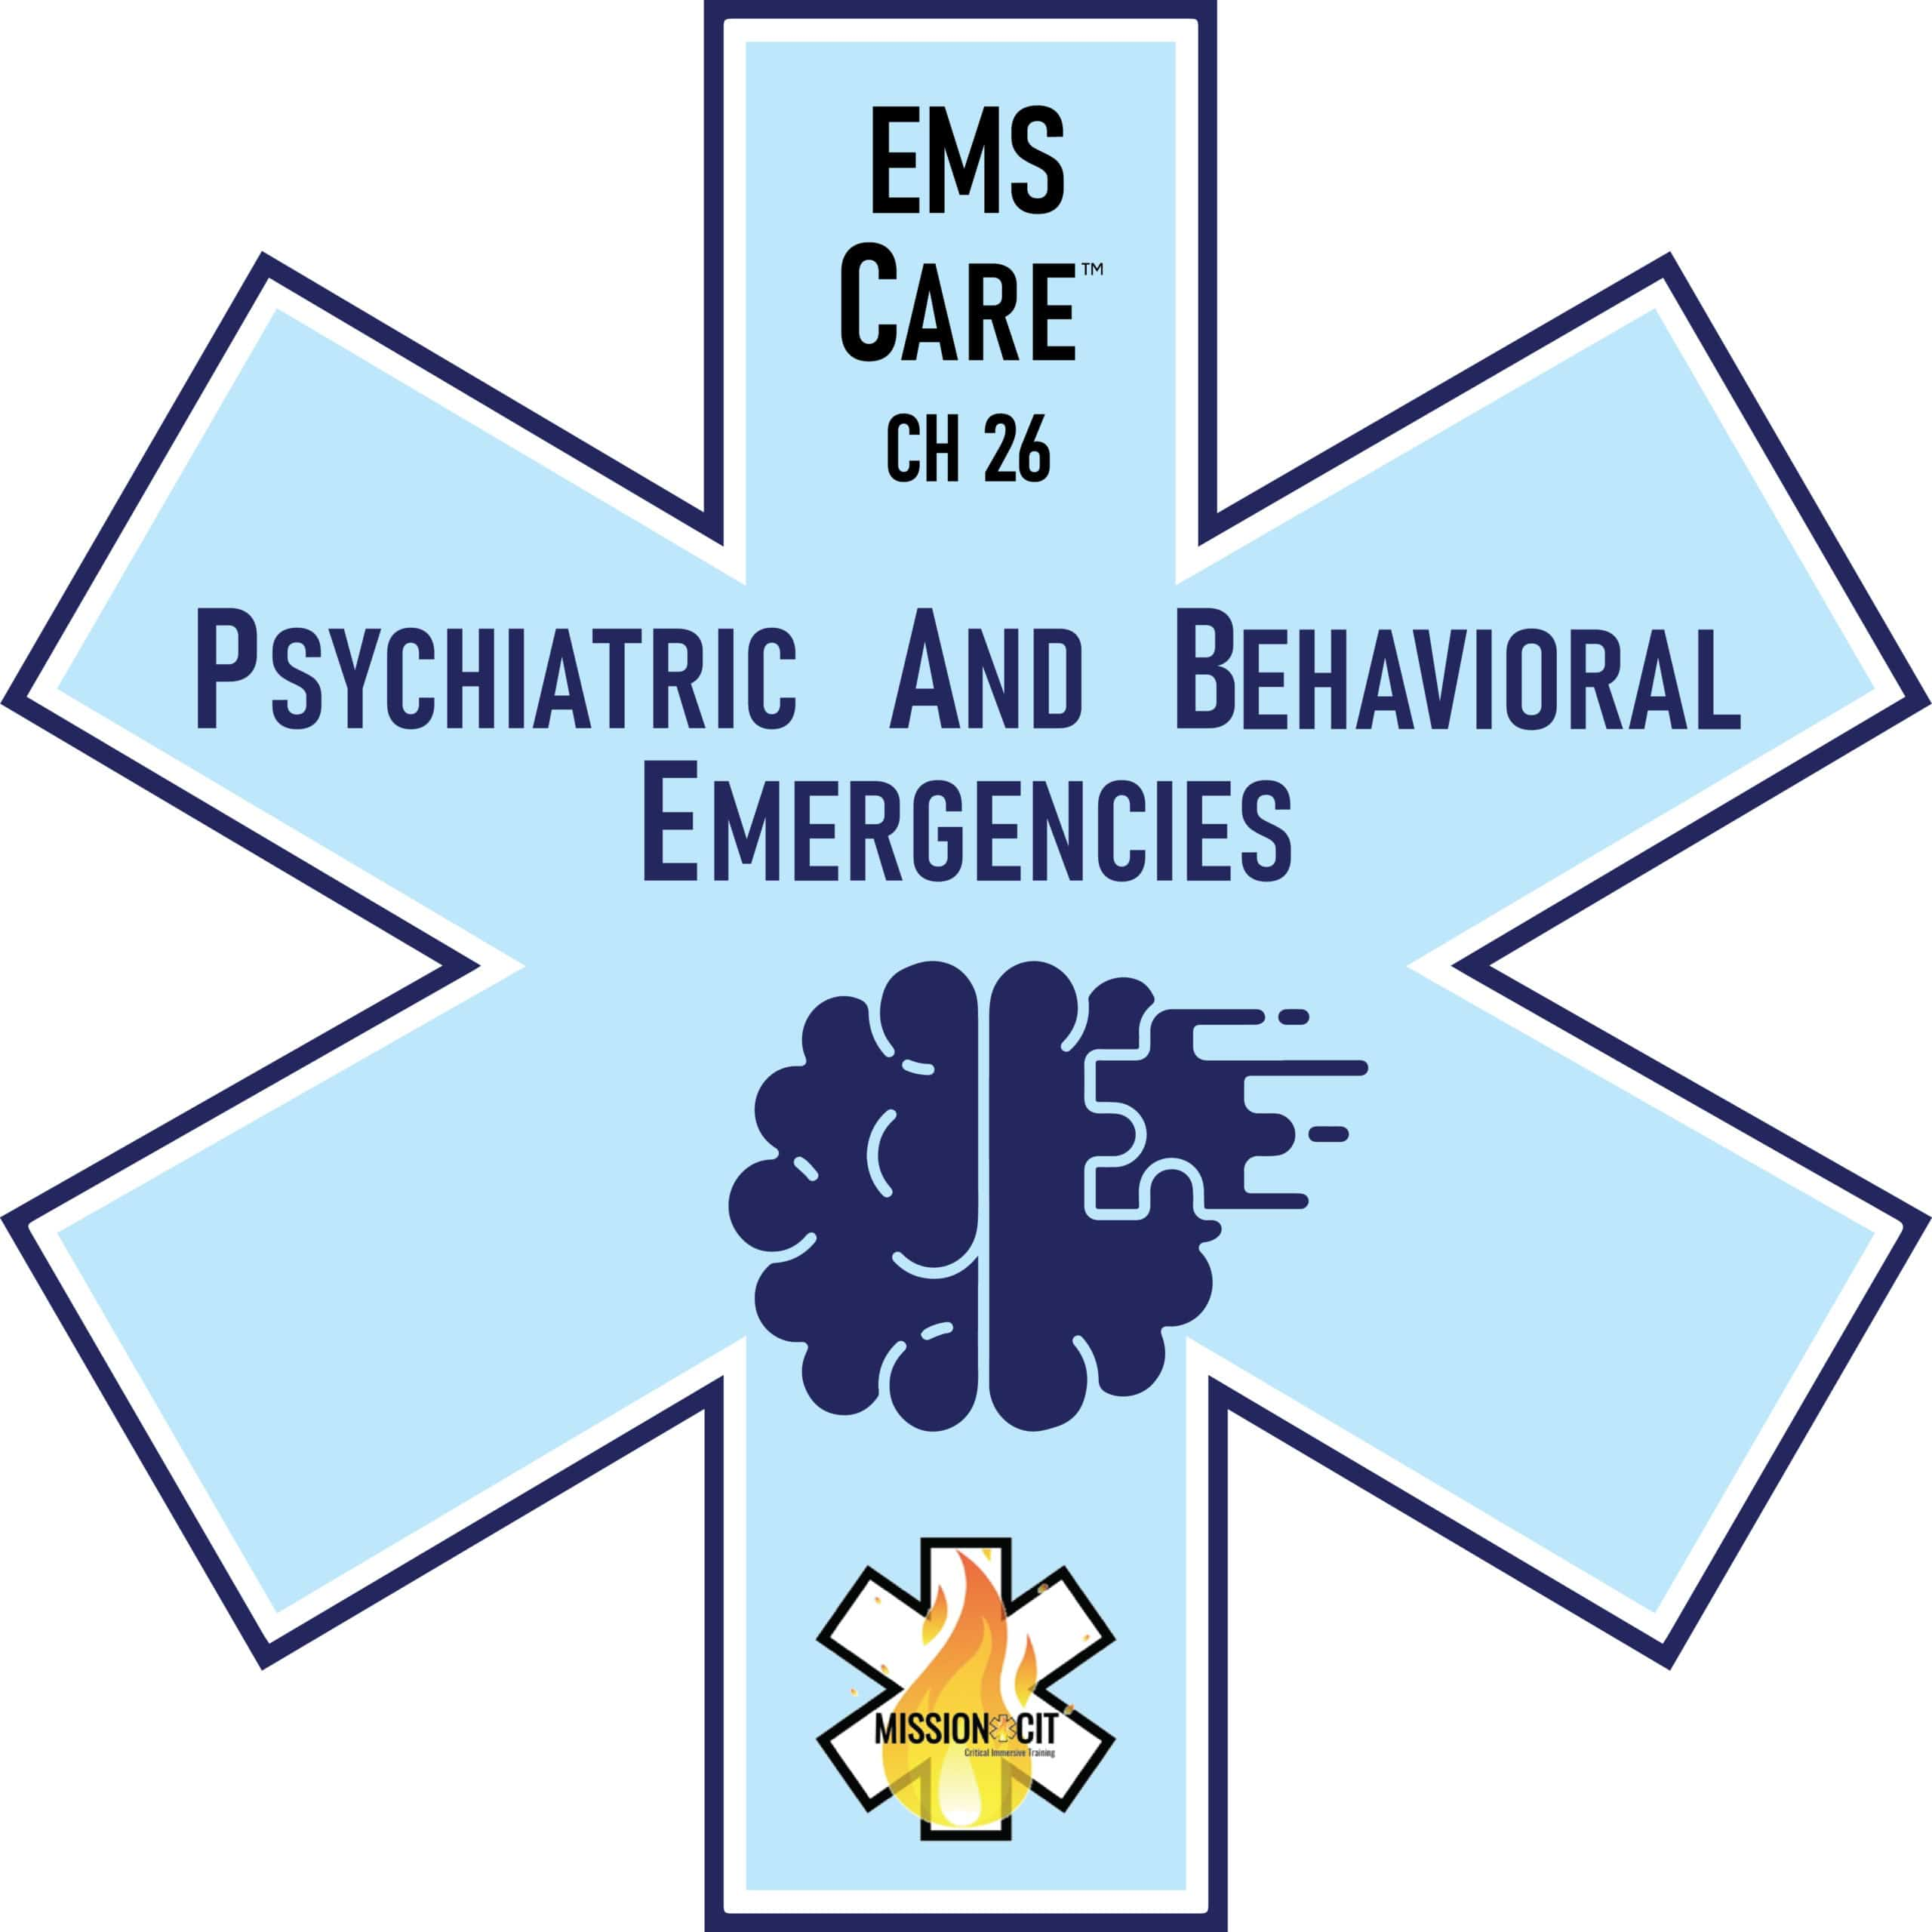 EMS Care Chapter 26 | EMT Psychiatric and Behavioral Emergencies